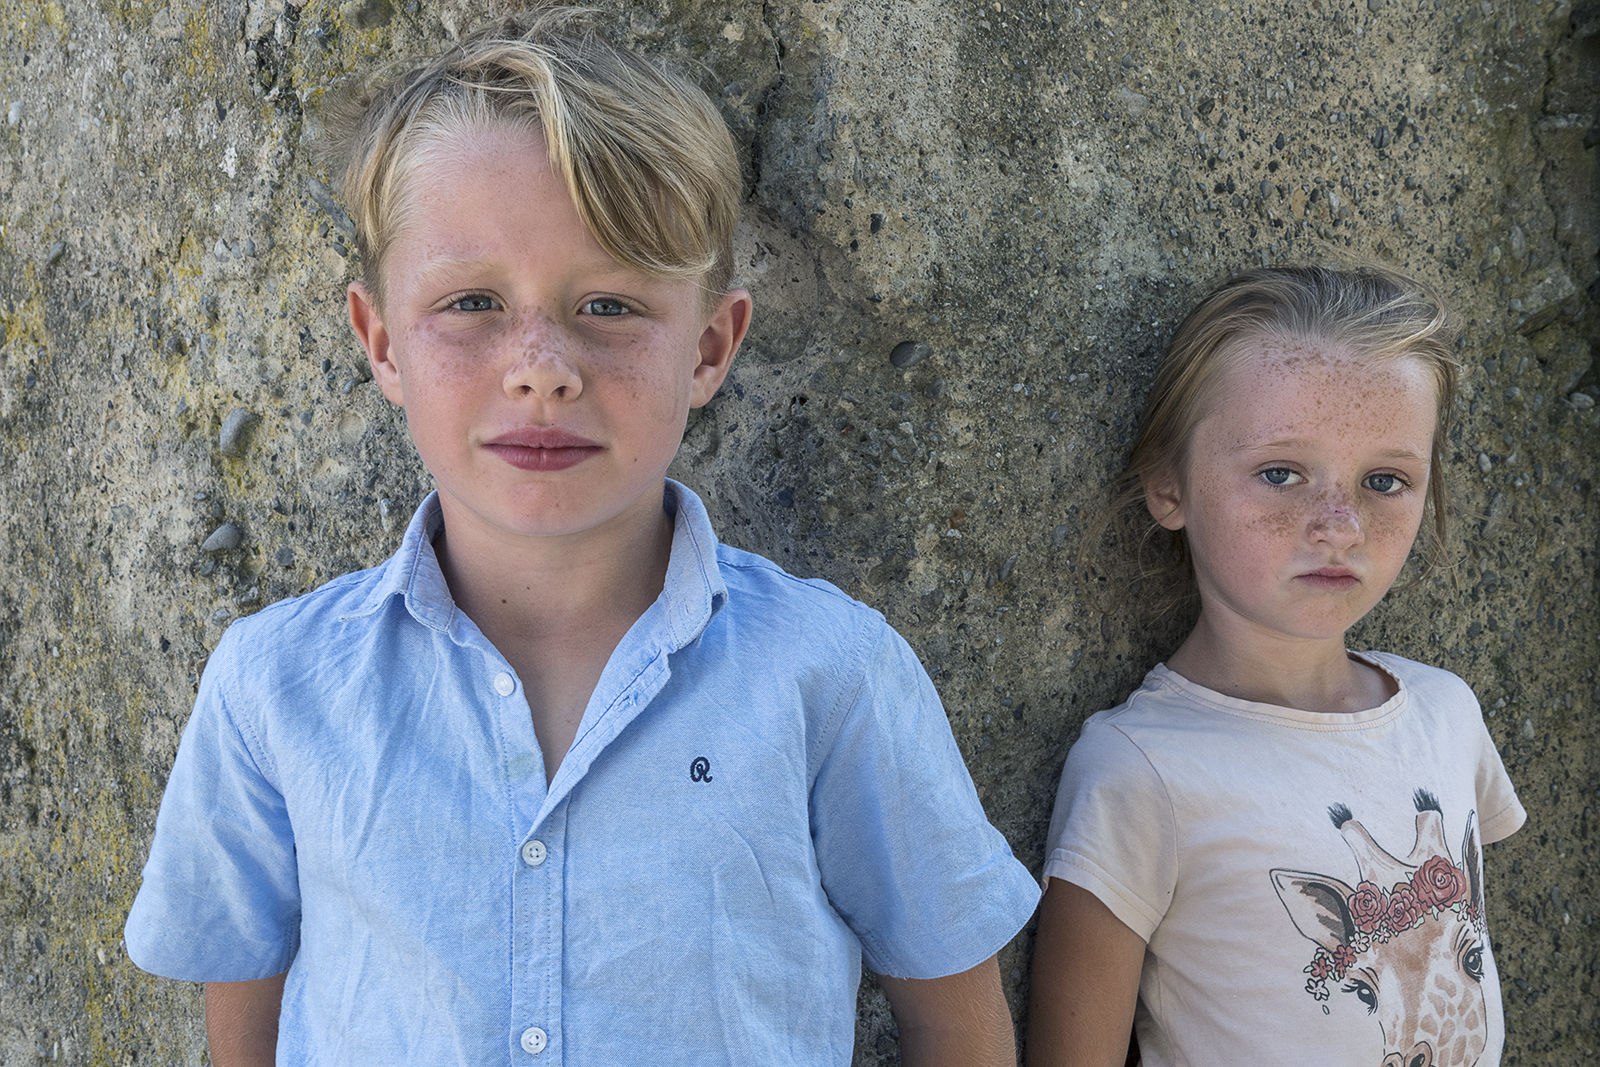 McDonagh Siblings, Athy, Kildare 2019